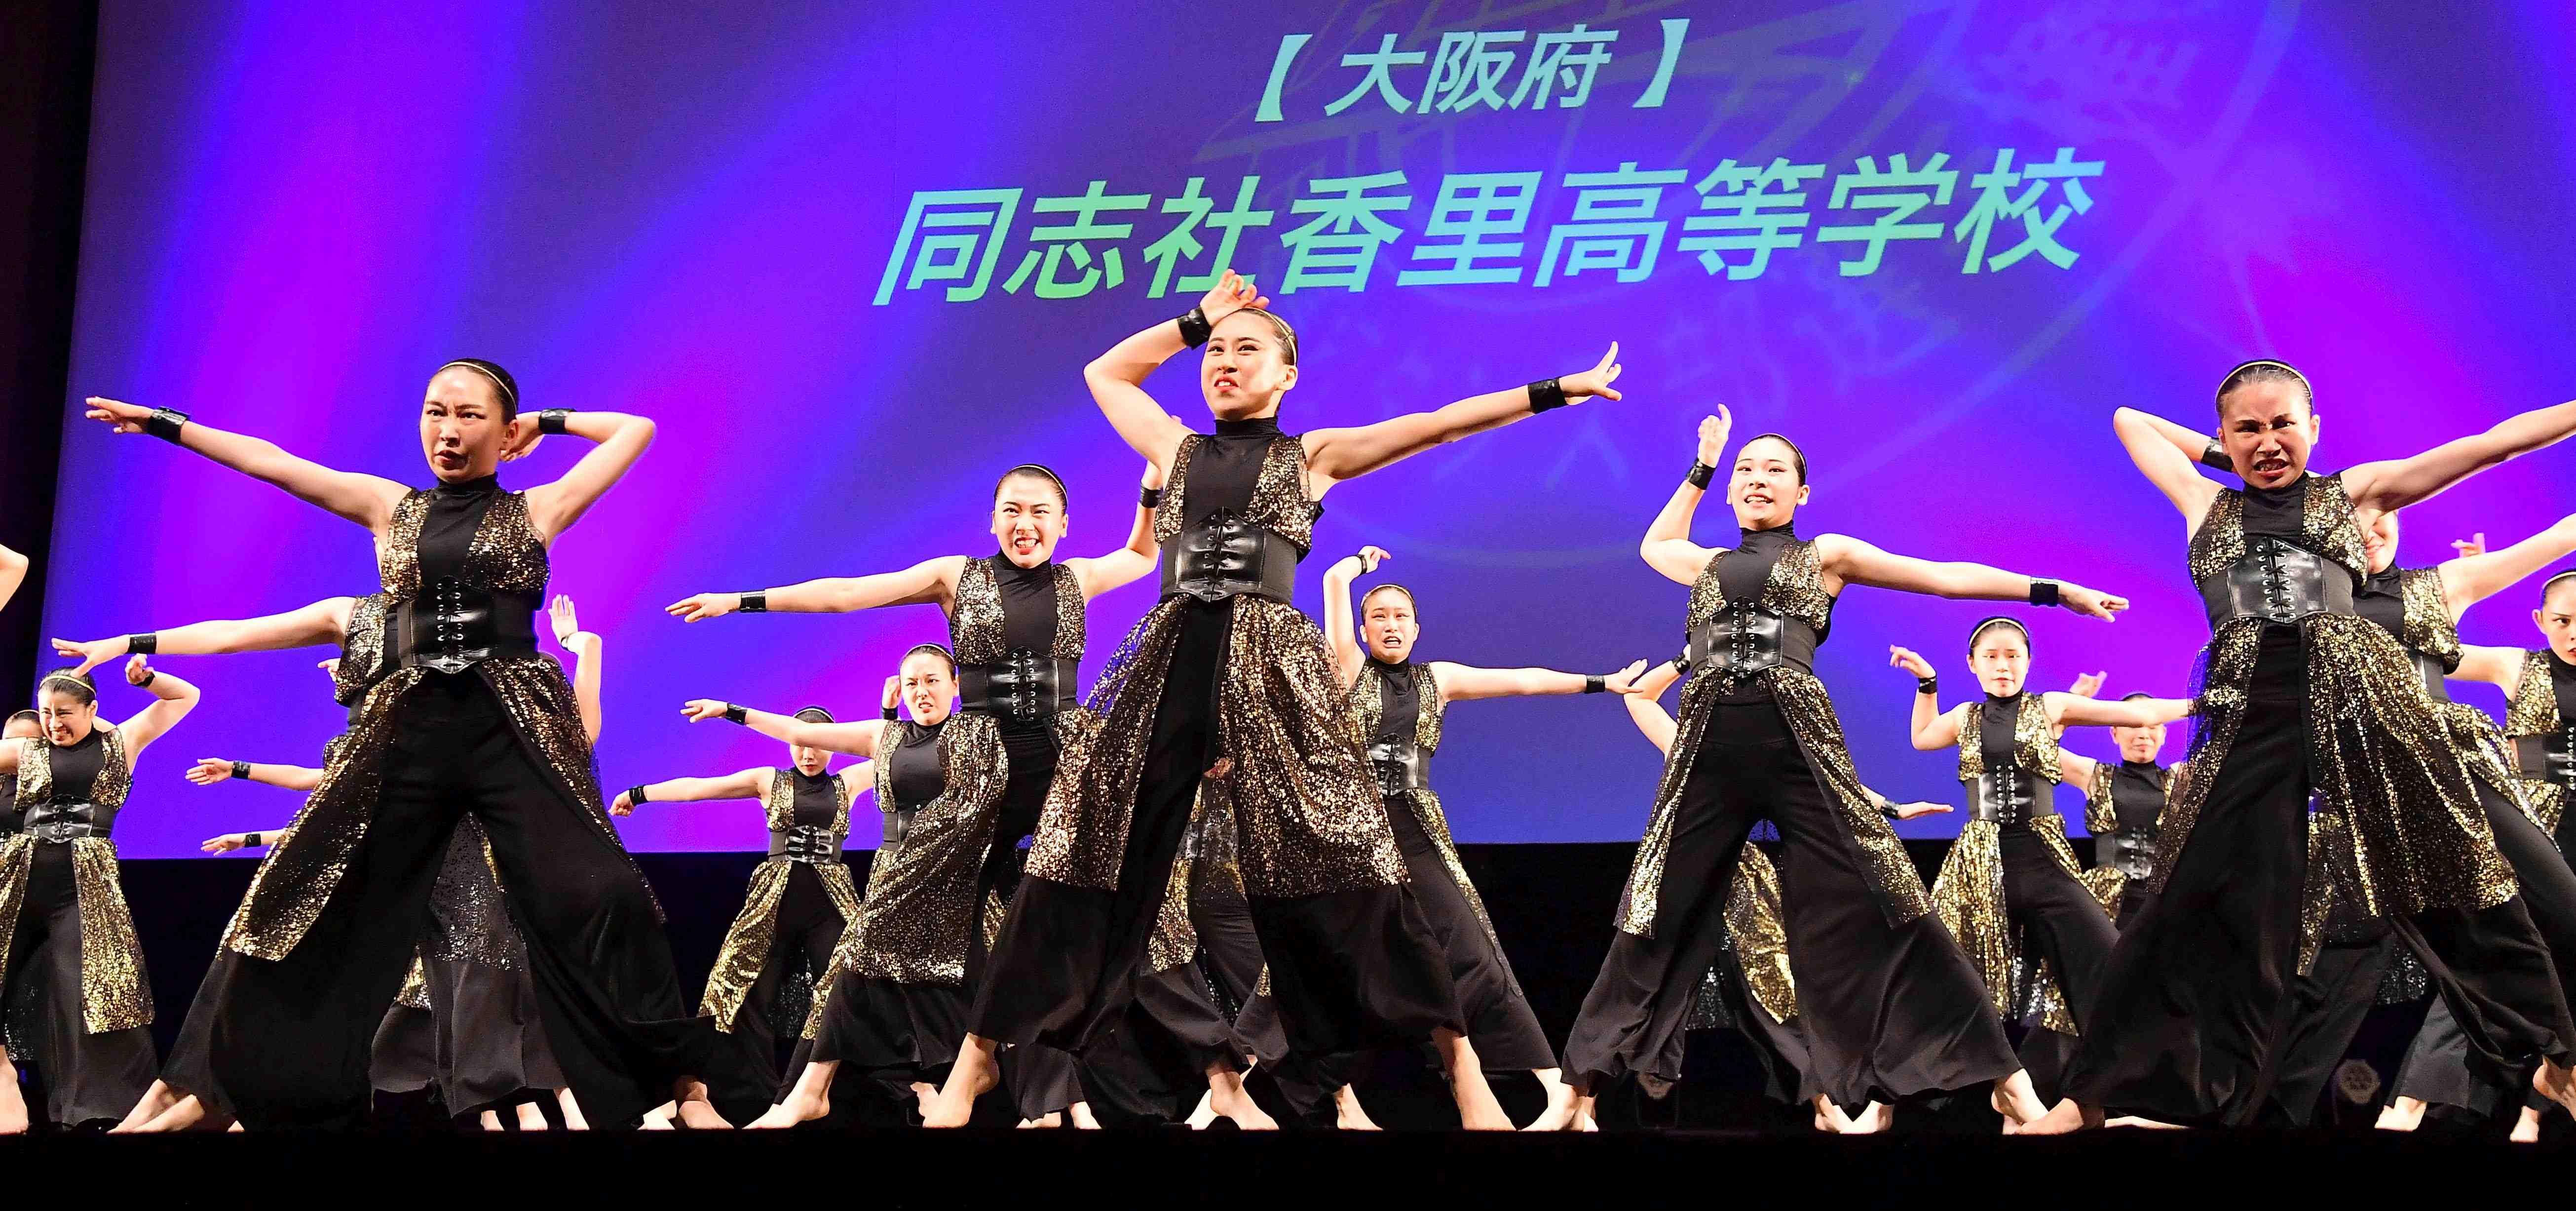 Japan High School Dance Club Competition 003